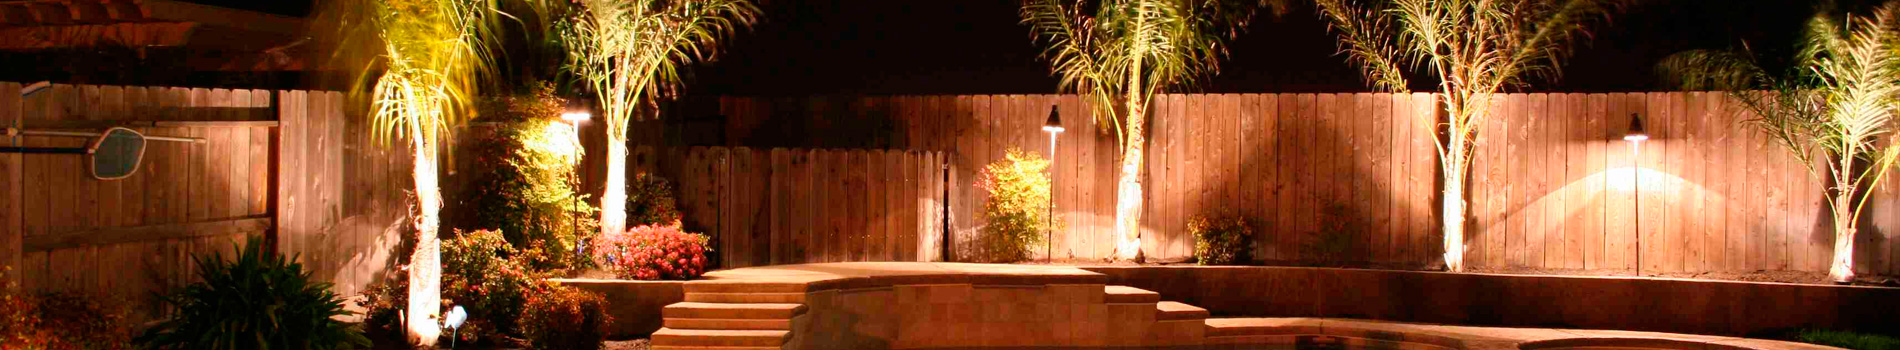 Lumipro iluminacion de exterior monterrey iluminacion para for Focos para exterior jardin